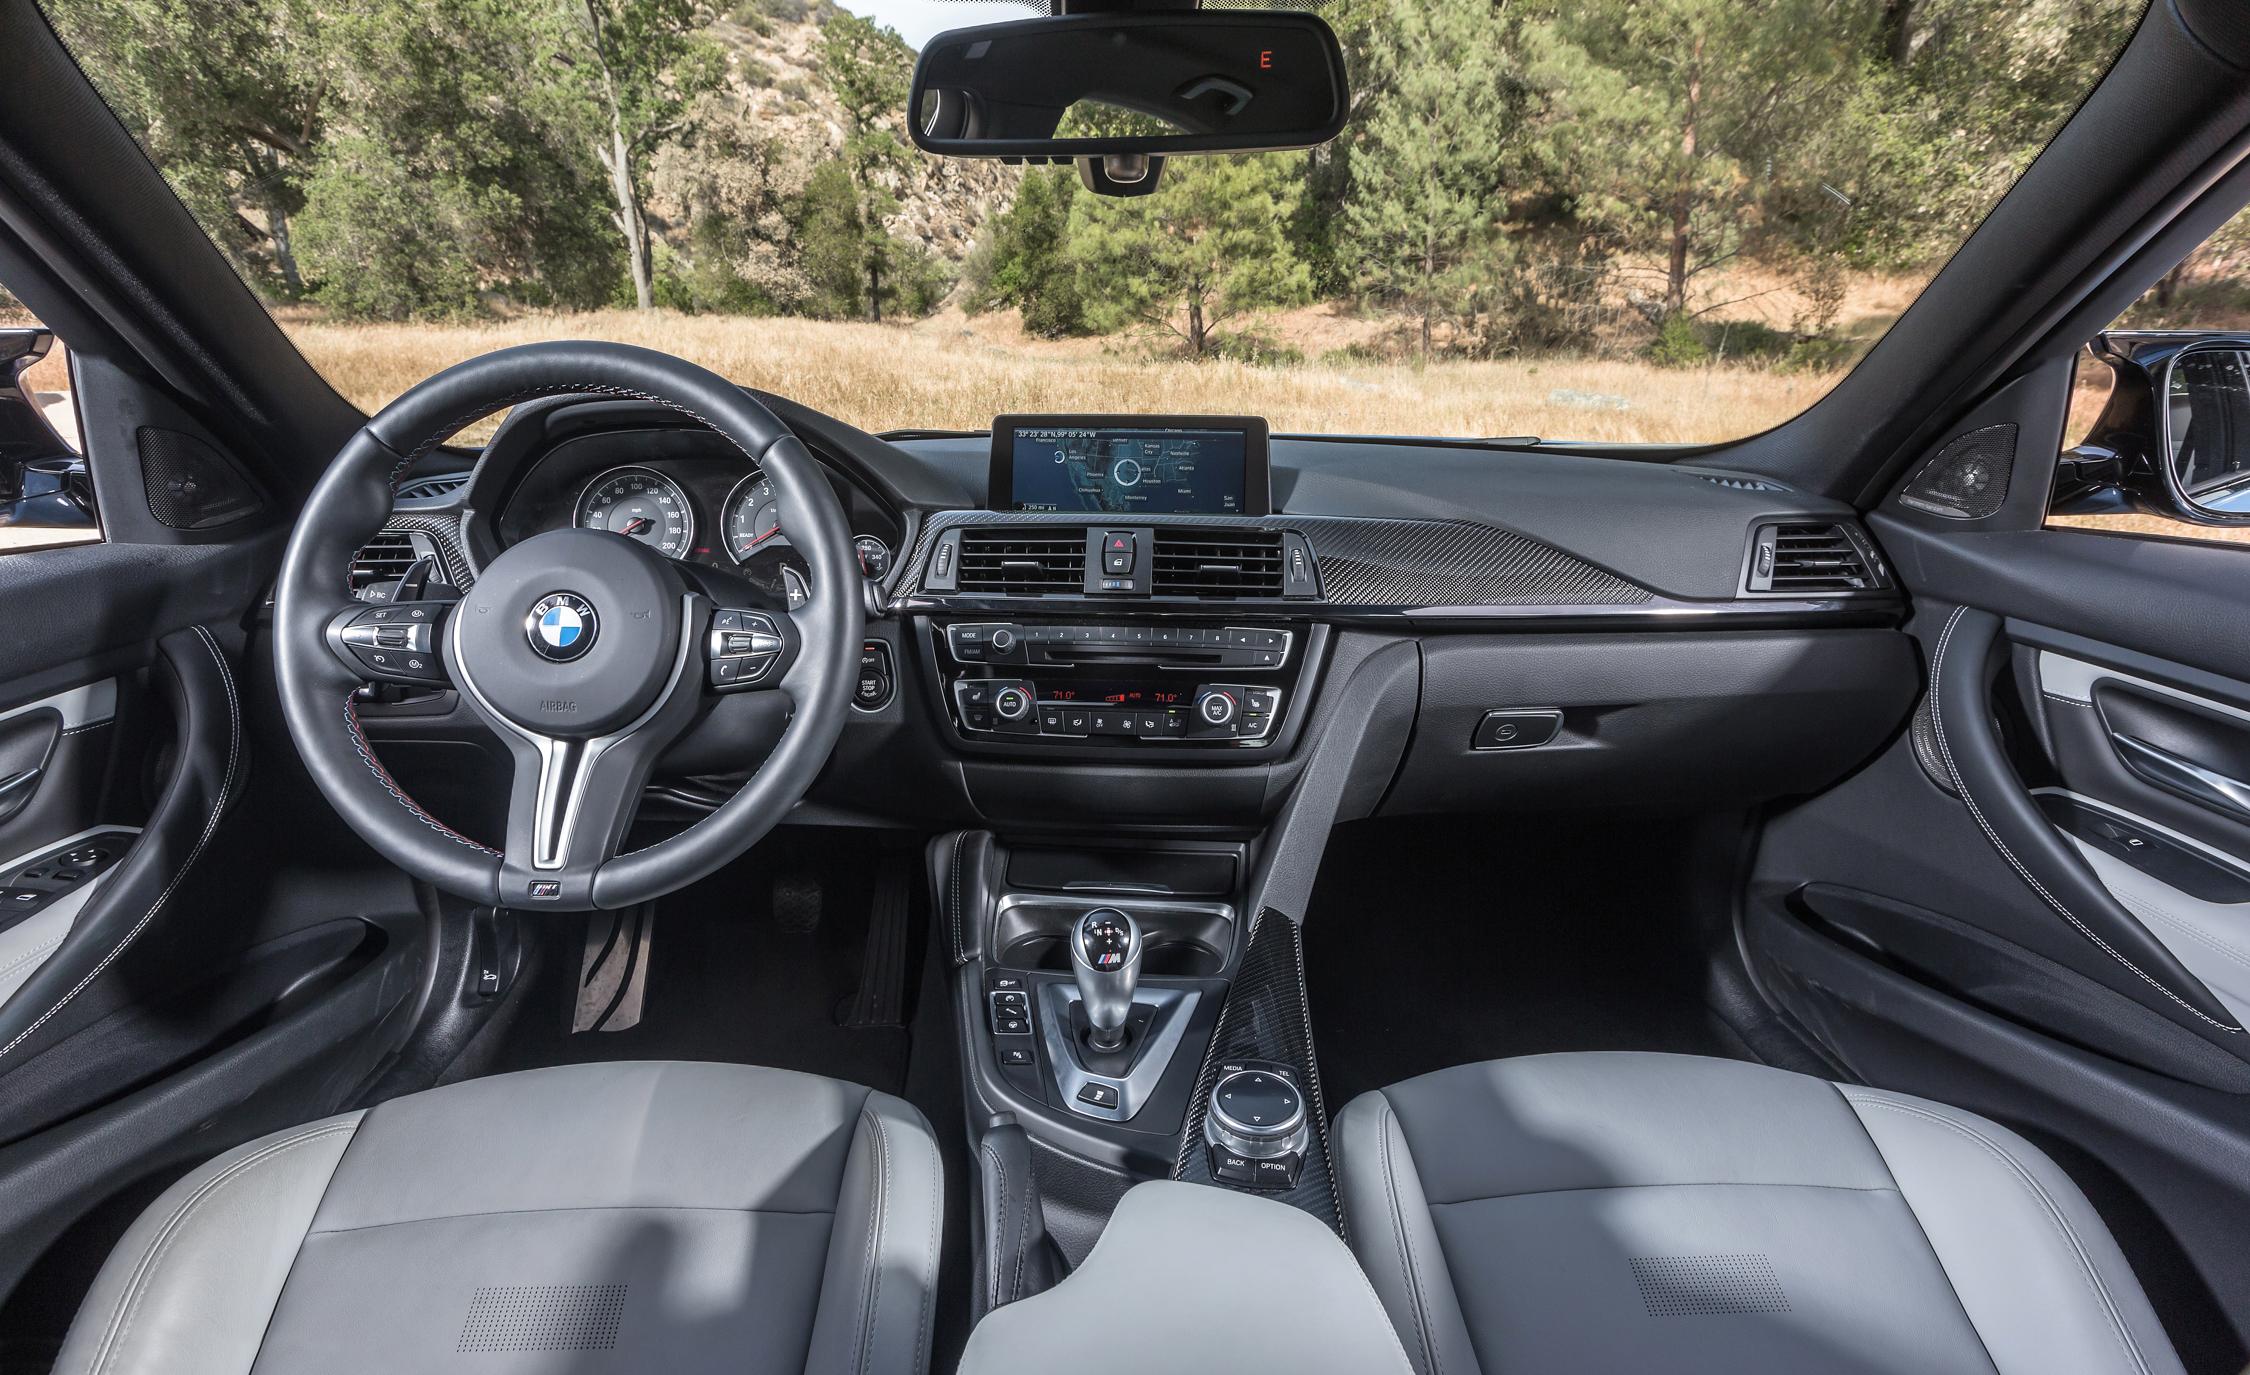 2015 BMW M3 Interior Cockpit and Dashboard